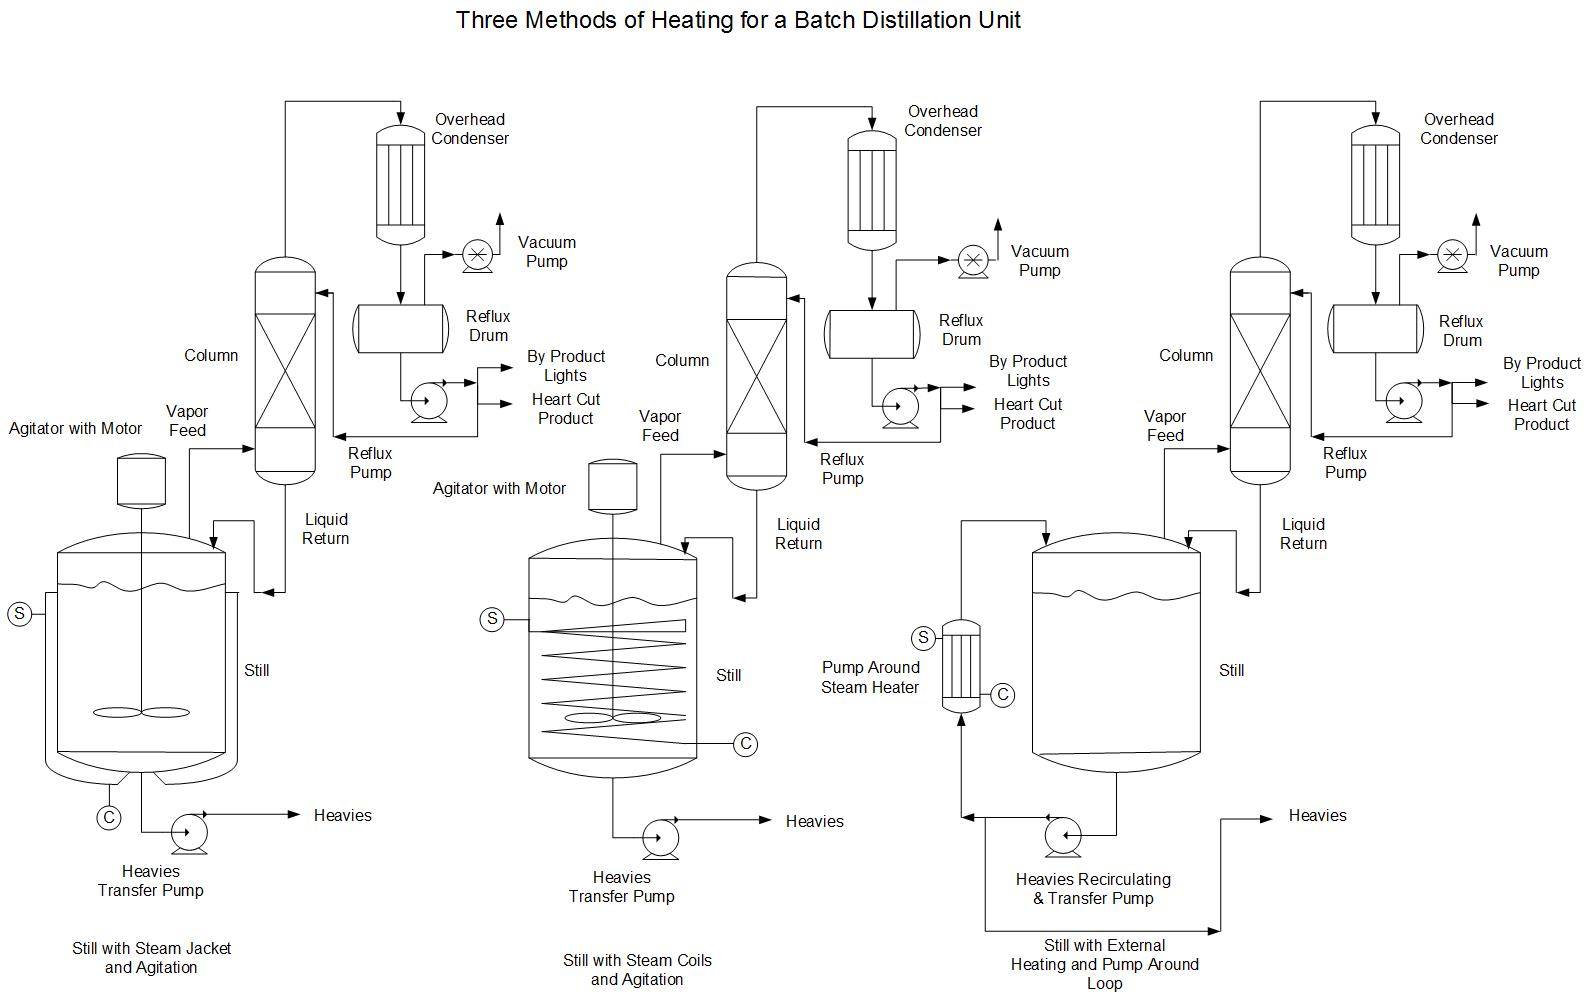 Designing A Batch Distillation Unit With Gantt Charts